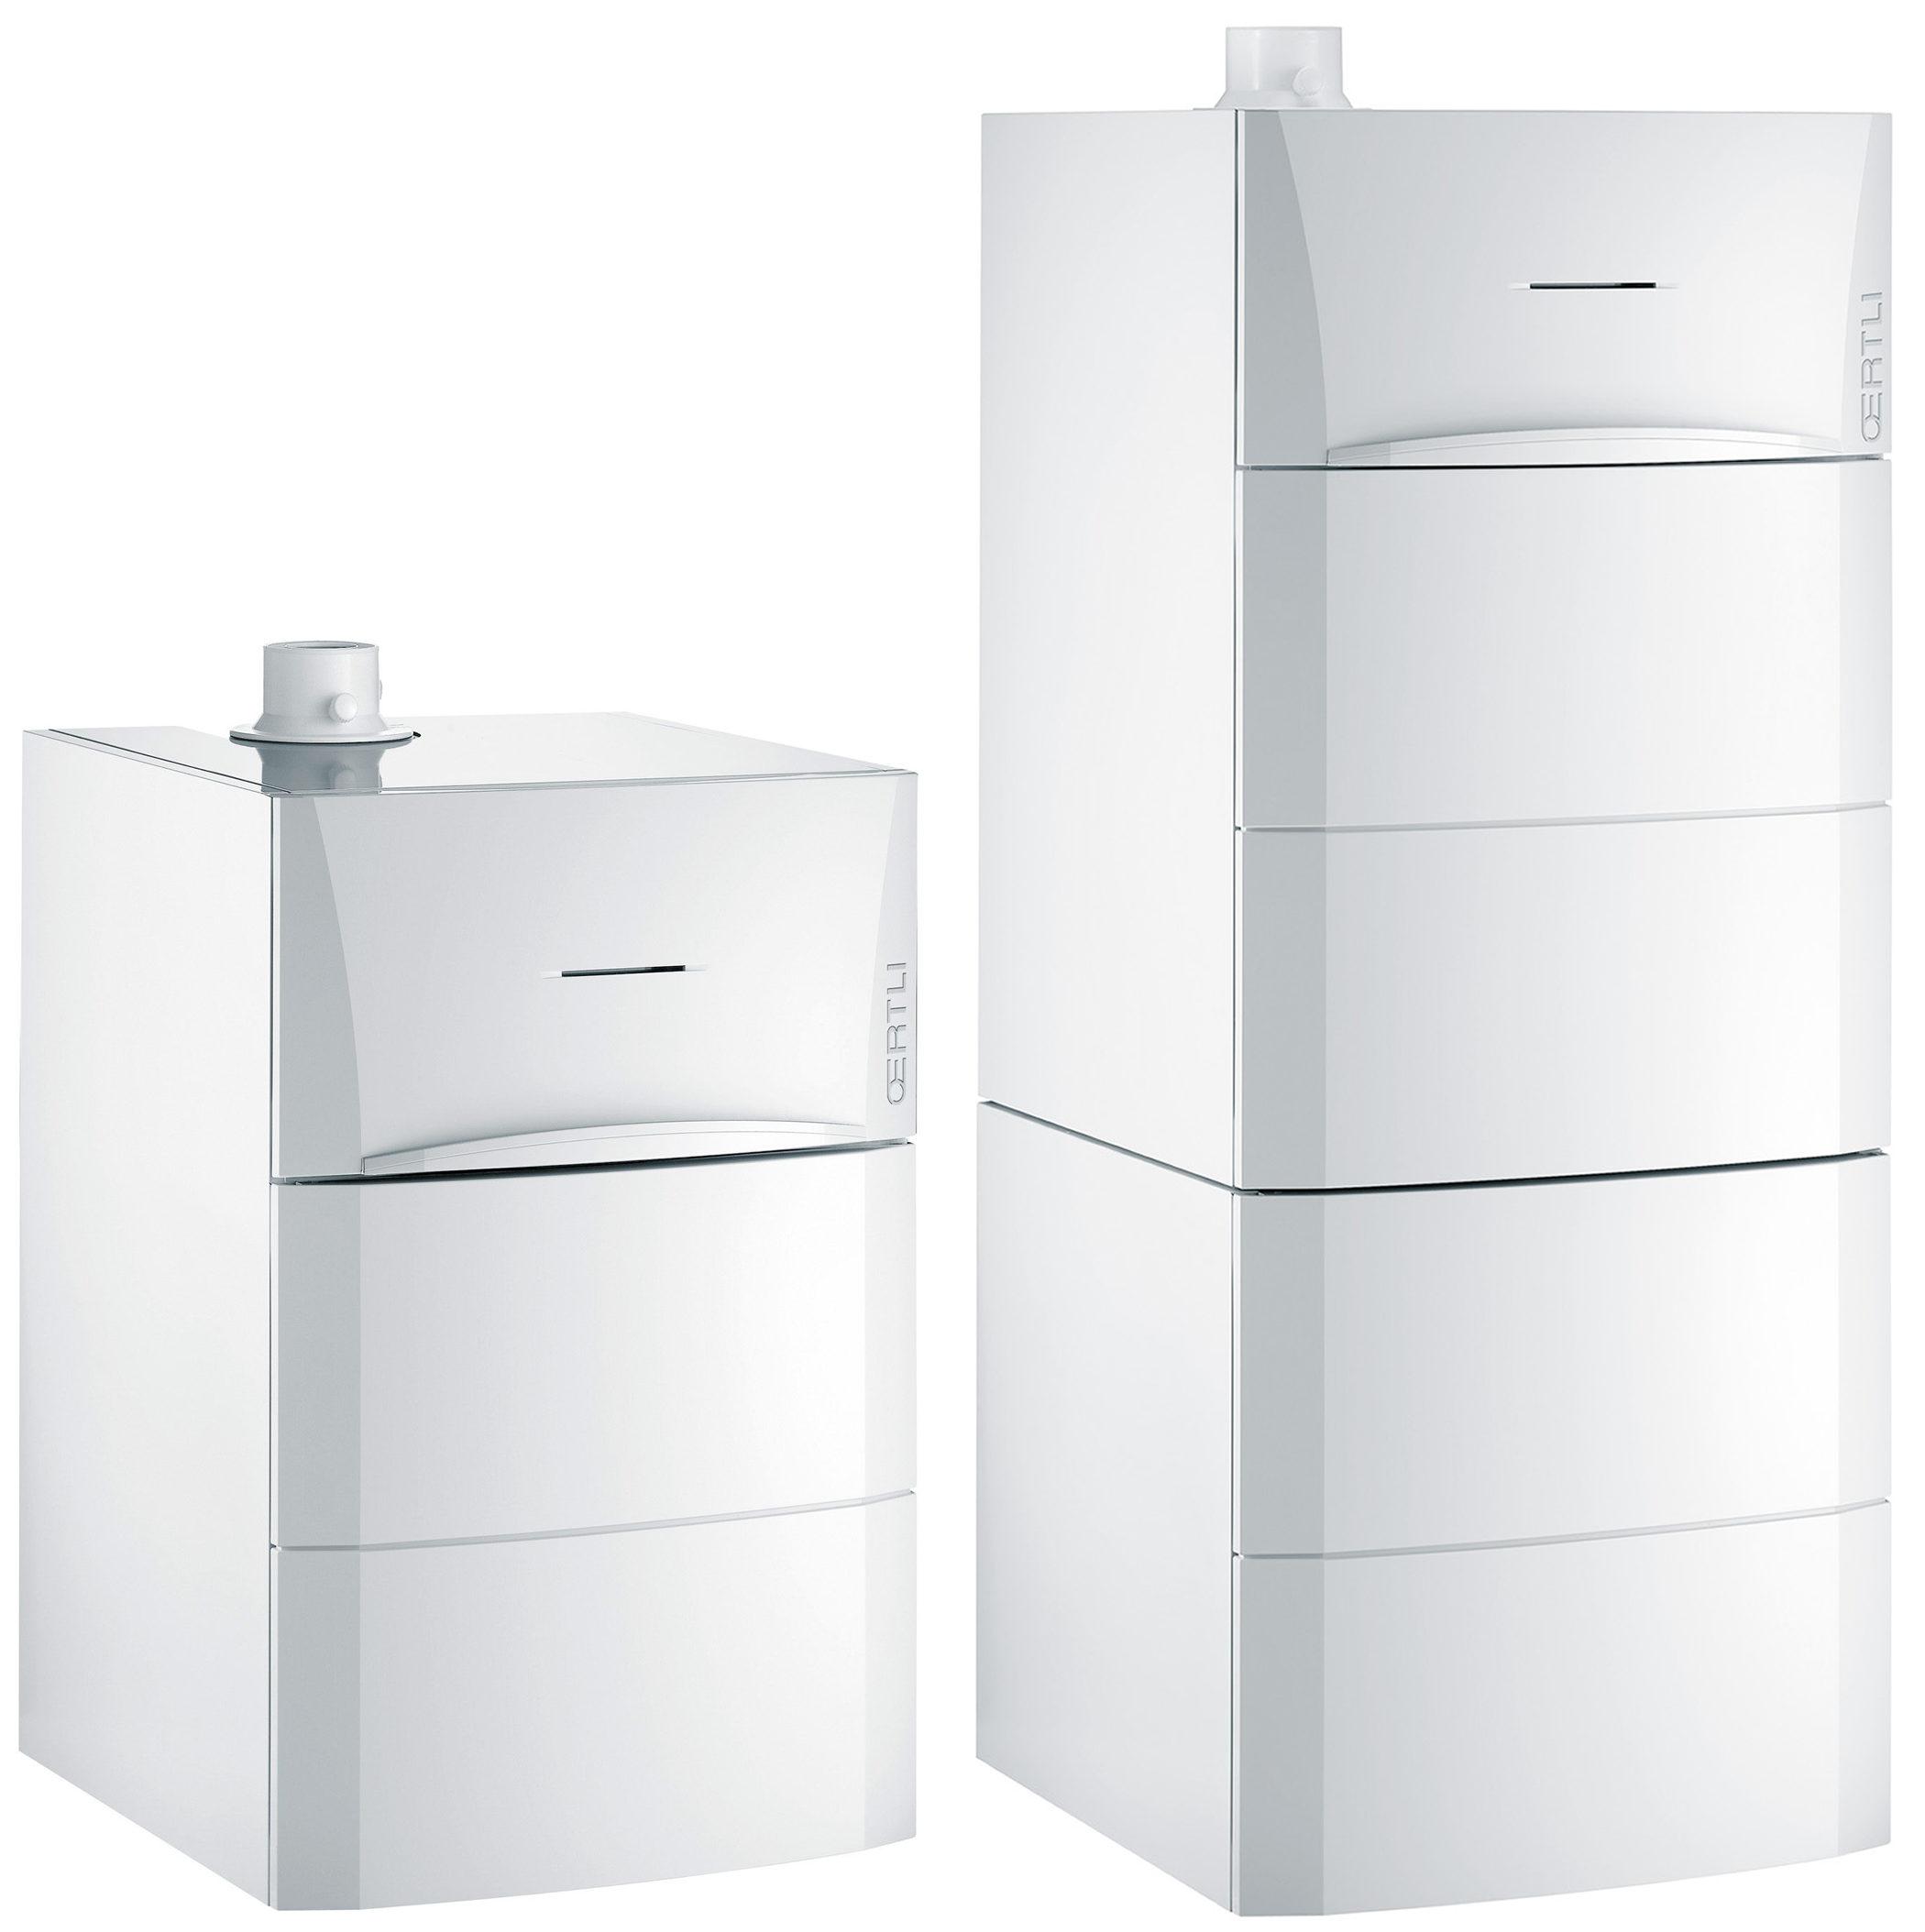 chaudi re au sol condensation oenoviagaz confort chauffage seul. Black Bedroom Furniture Sets. Home Design Ideas